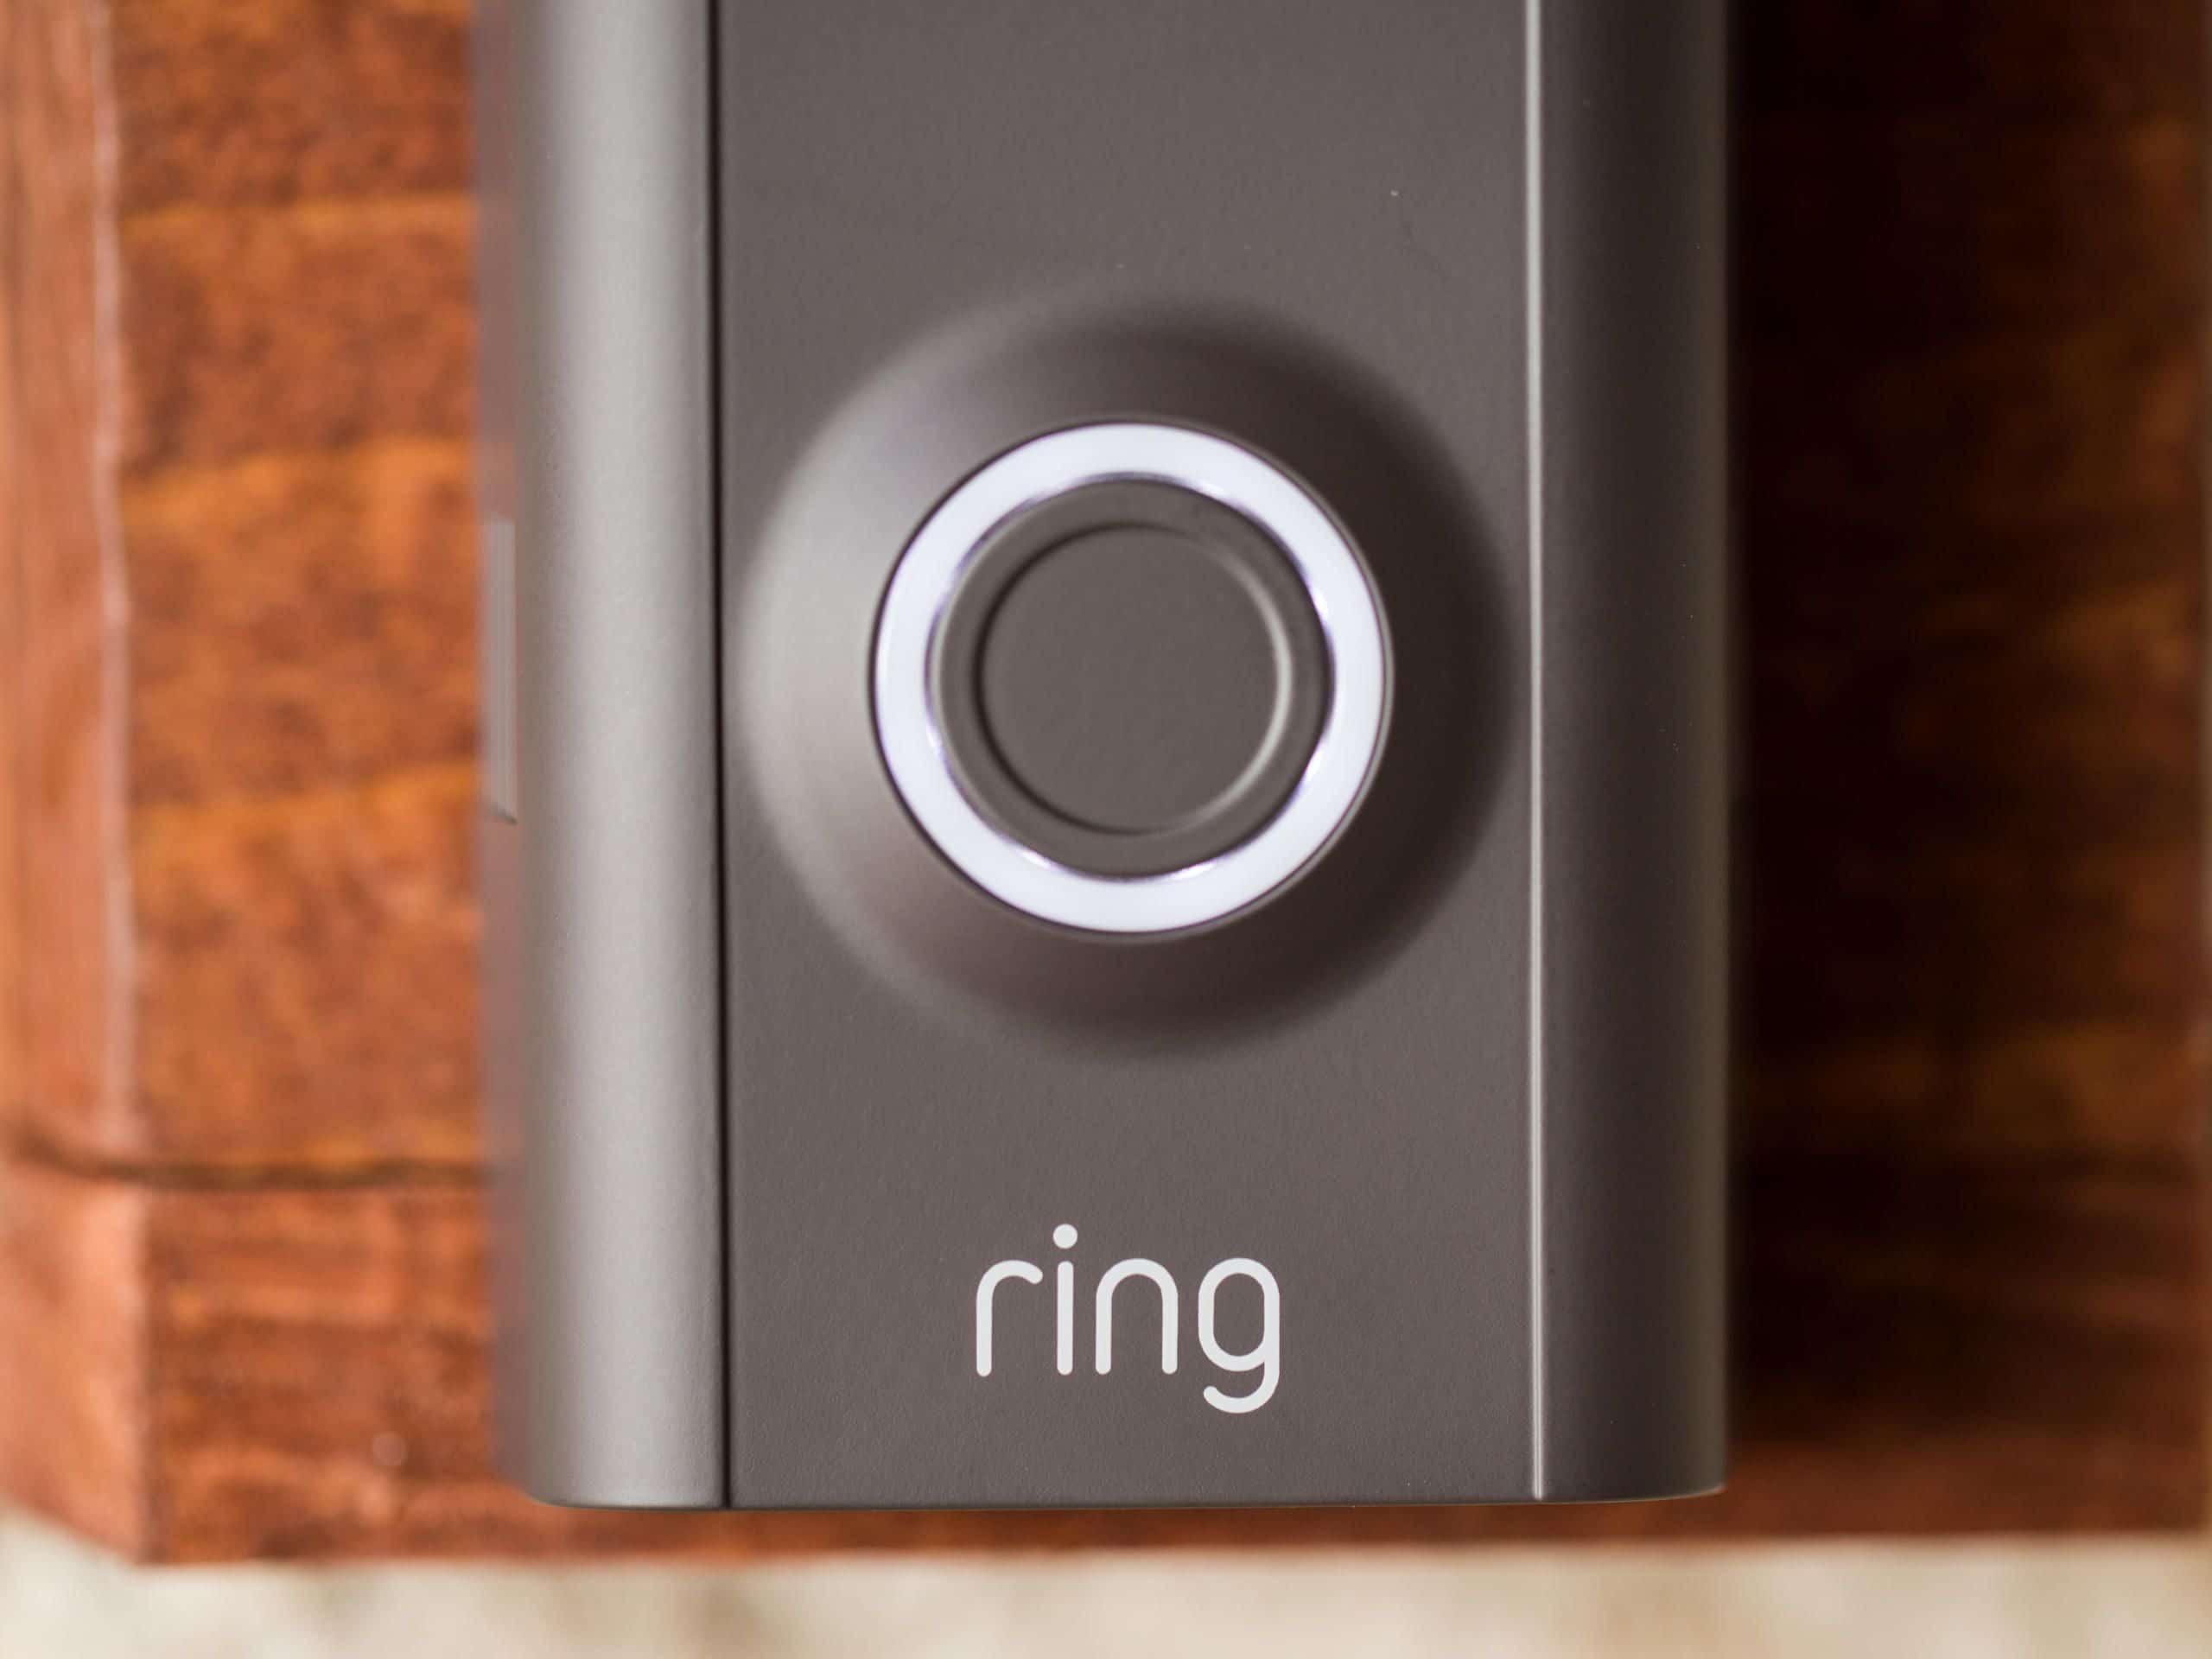 ring-video-doorbell-two-2